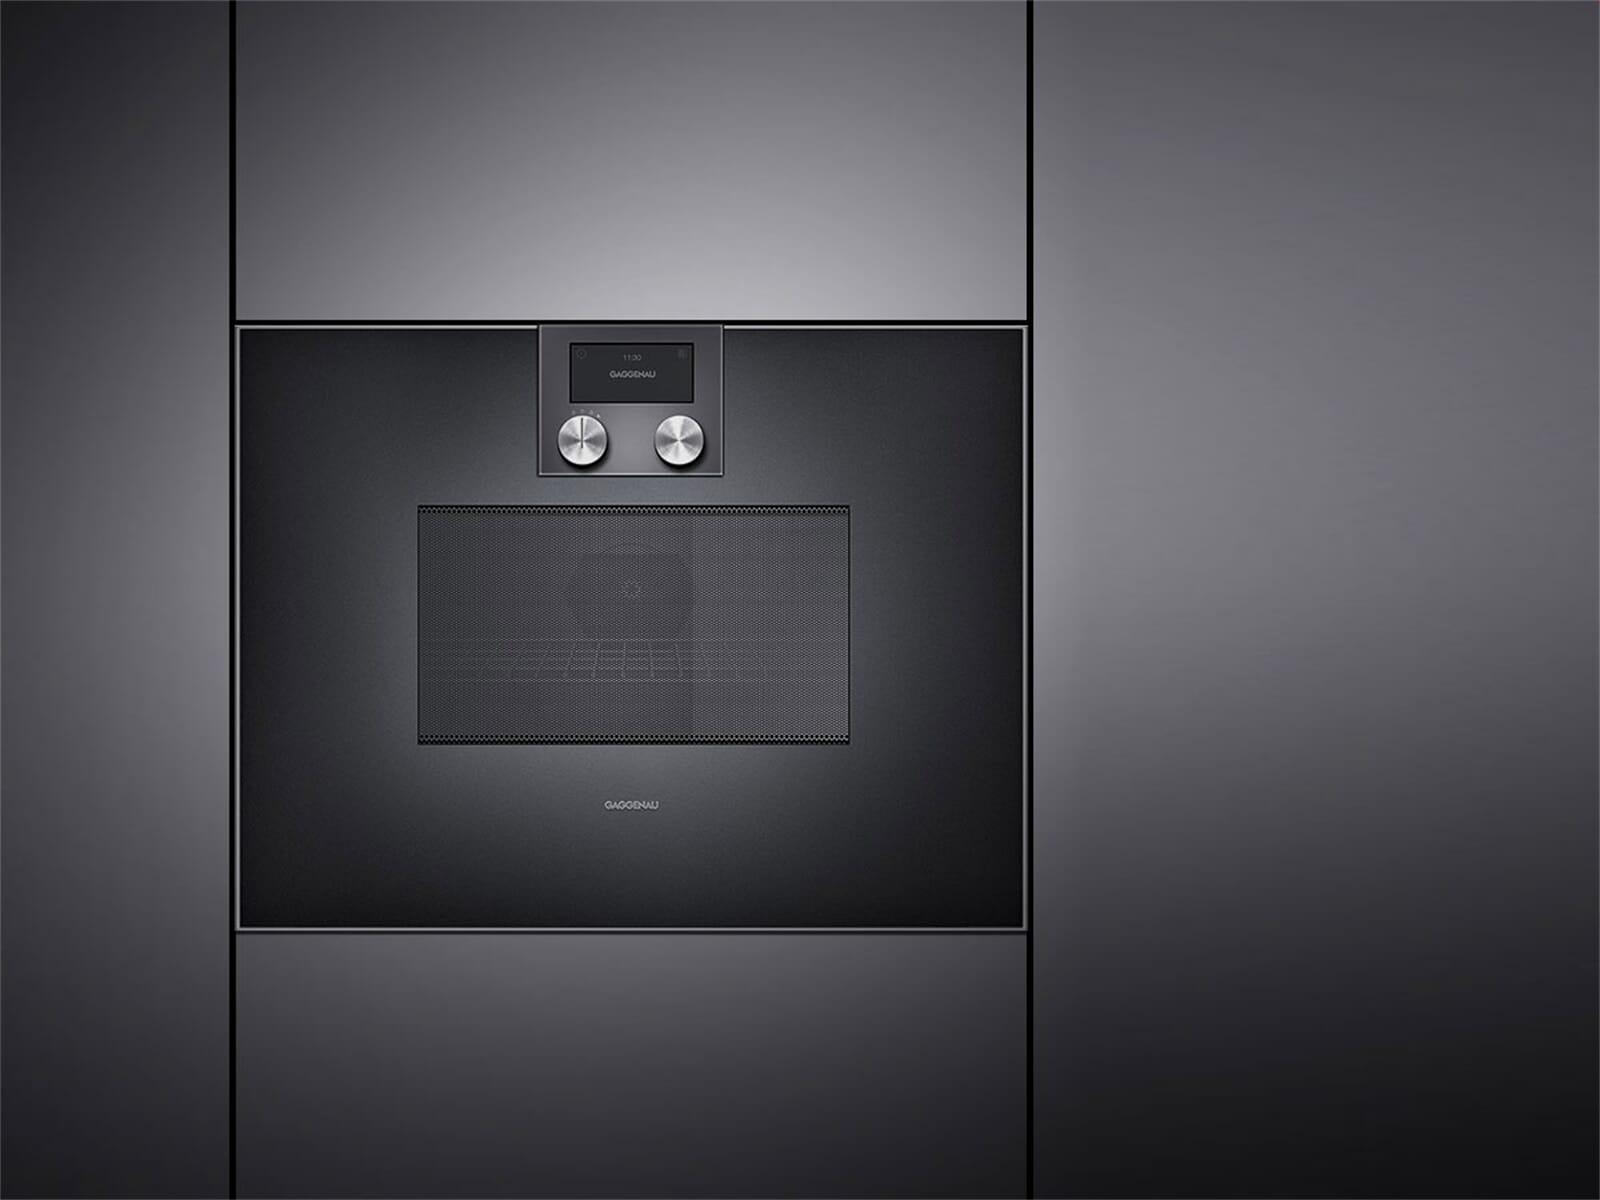 gaggenau bm 451 100 mikrowellen backofen serie 400 anthrazit. Black Bedroom Furniture Sets. Home Design Ideas